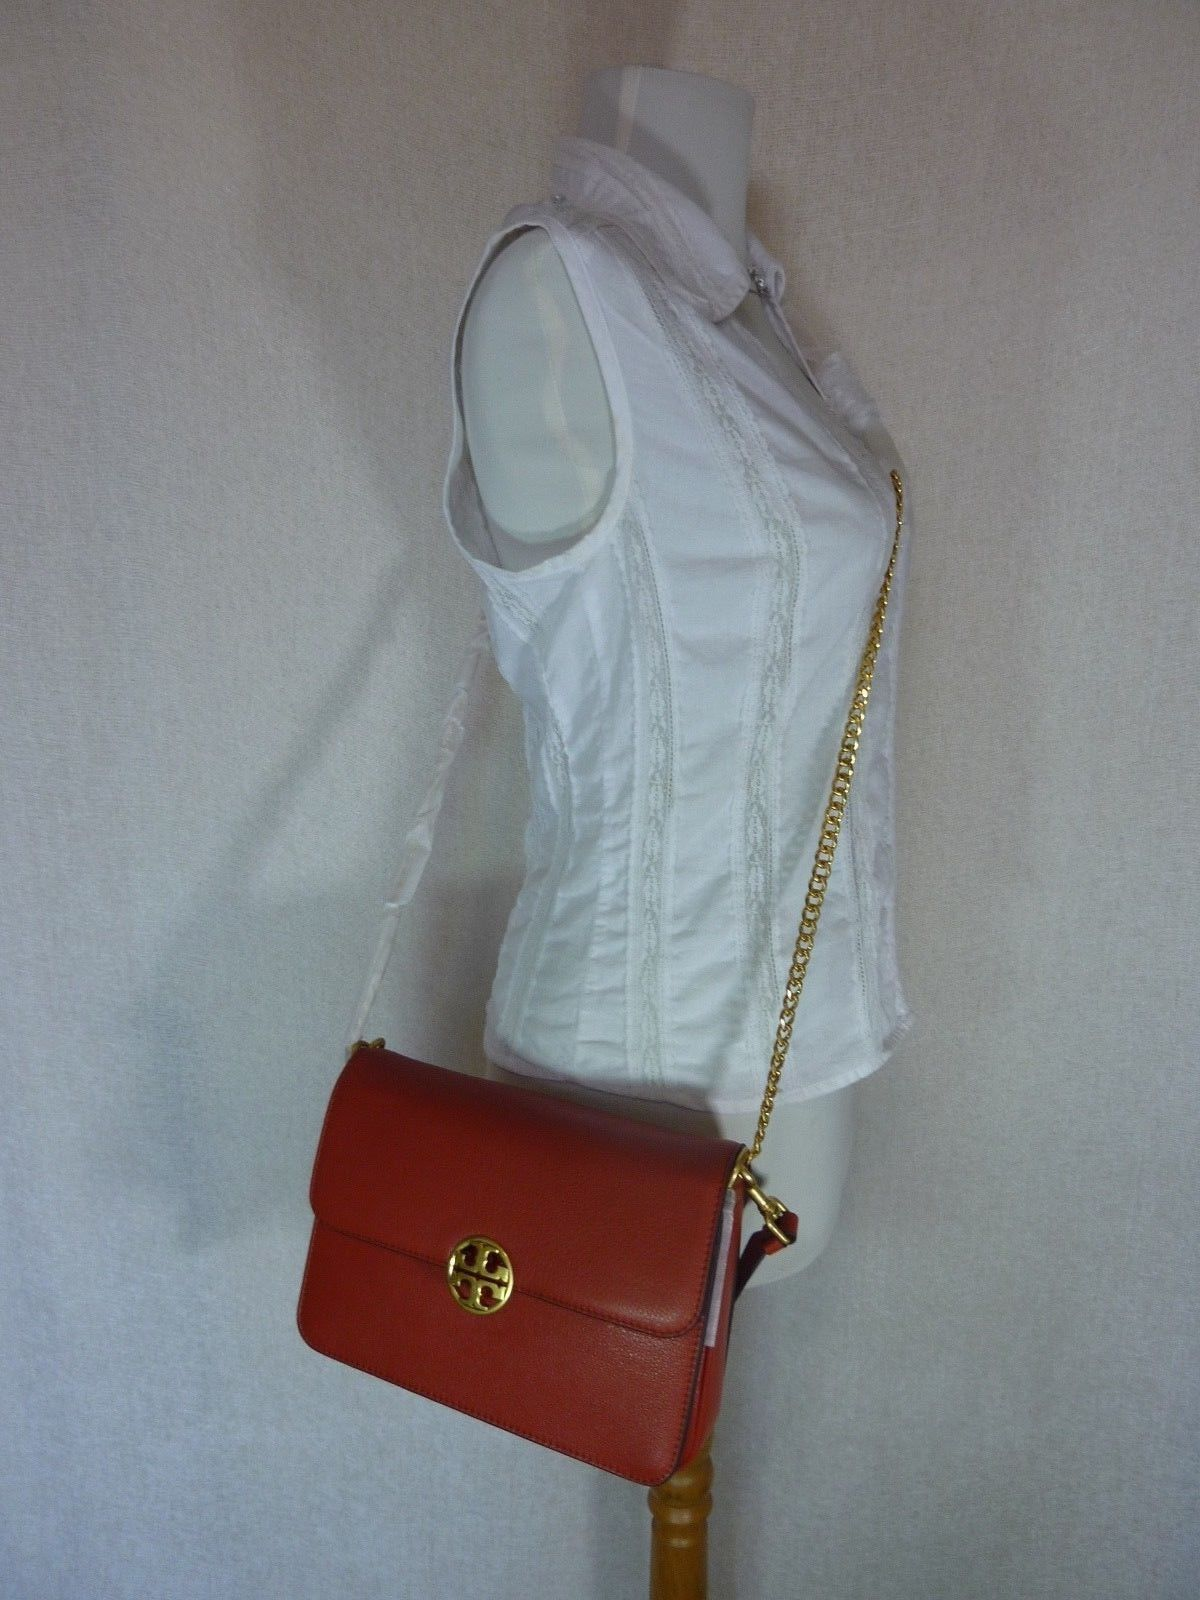 NWT Tory Burch Kola Chelsea Convertible Shoulder Bag  - $498 image 3